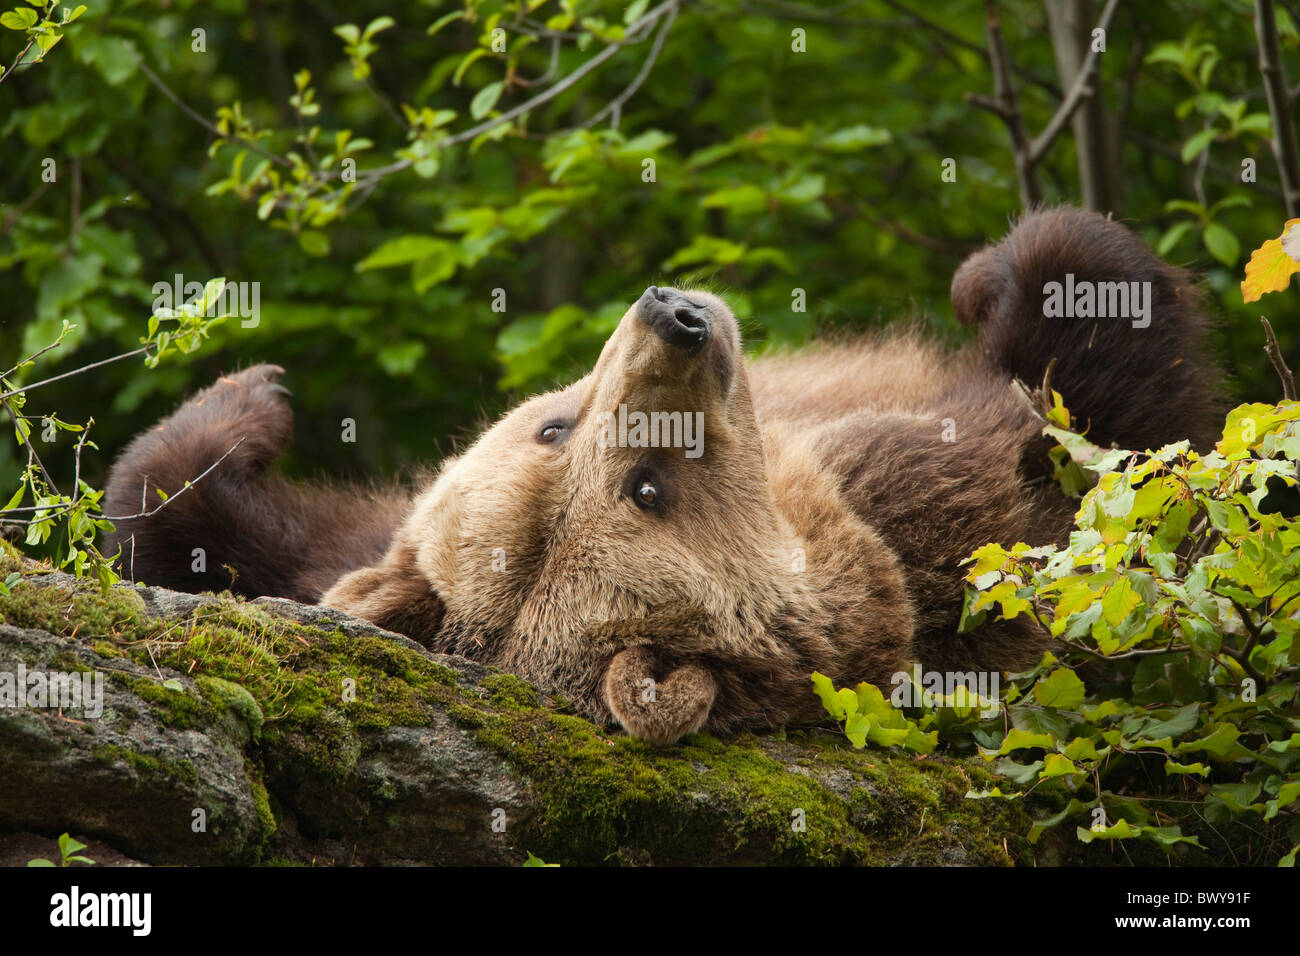 Female Brown Bear Lying on Rock, Bavarian Forest National Park, Bavaria, Germany Stock Photo